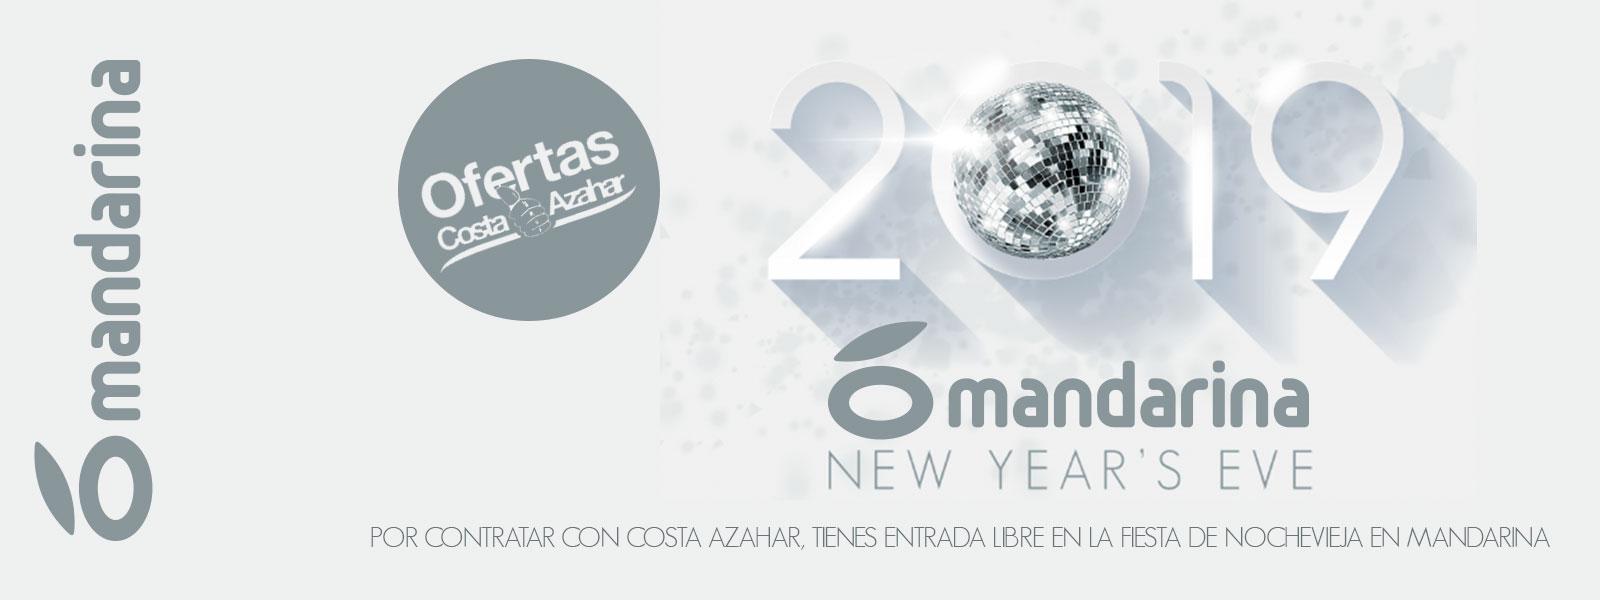 Fiesta Fin de año Mandarina